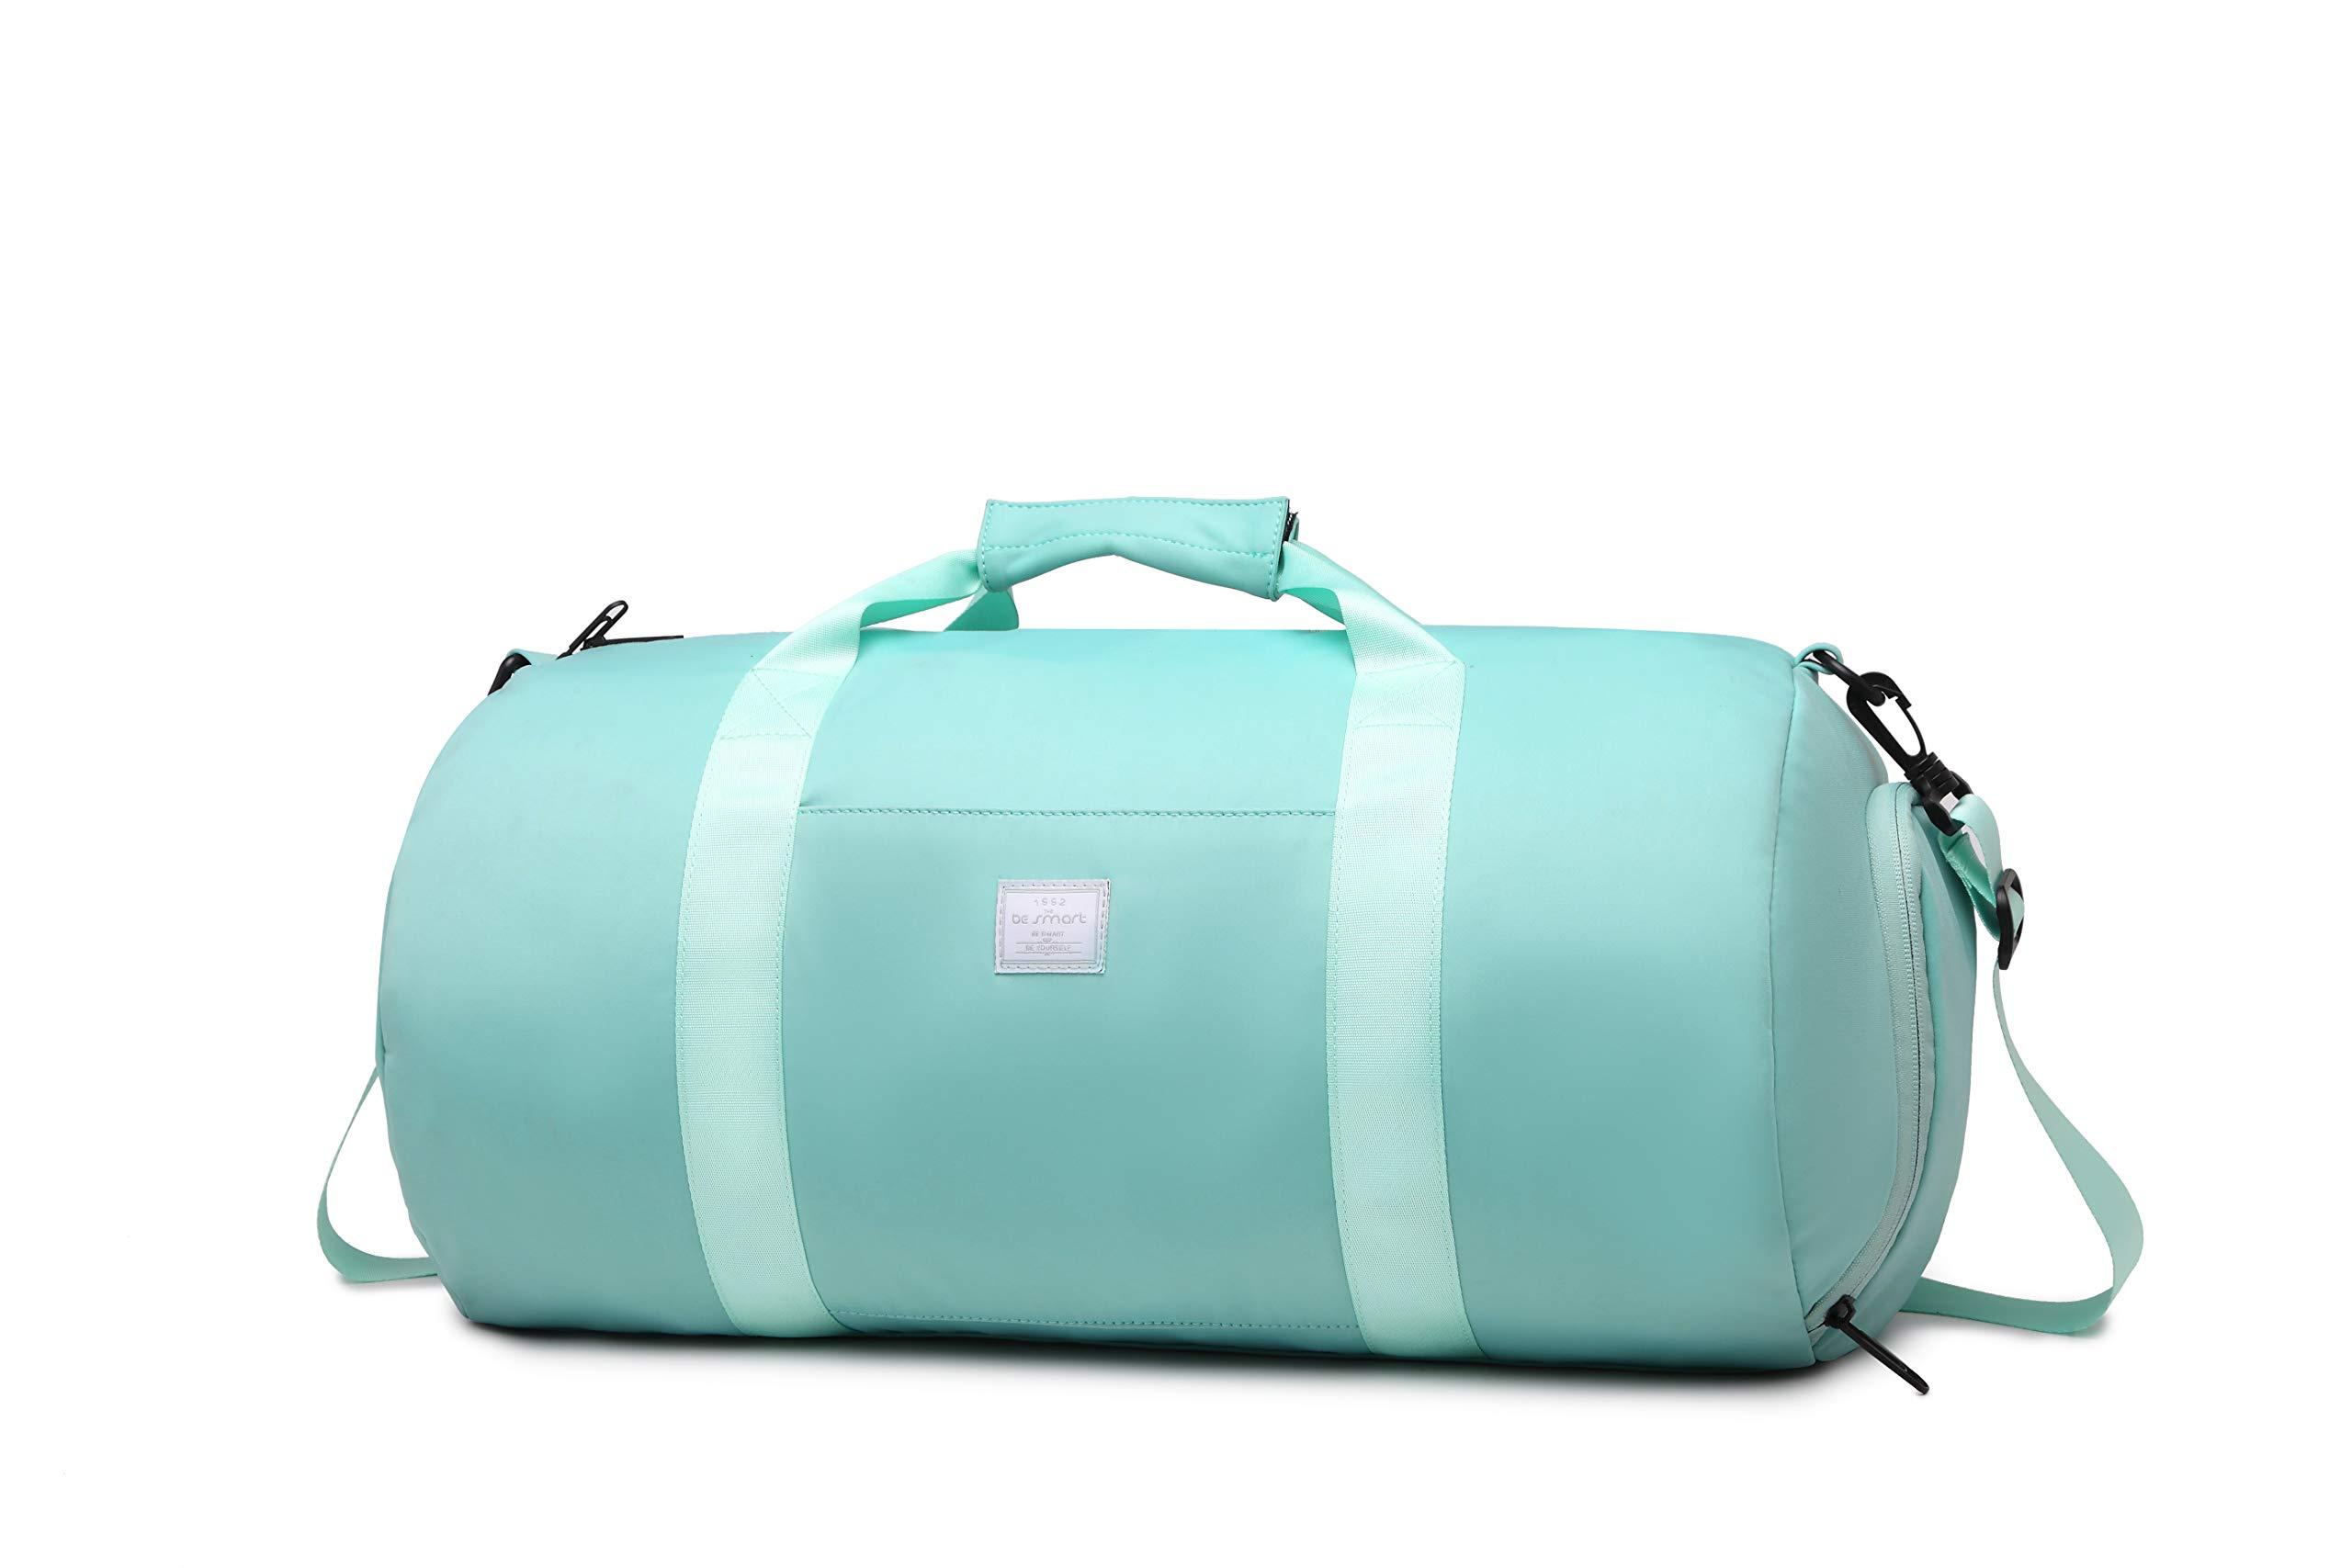 BE SMART Light-weight Waterproof Duffel Bag Gym Bag Sport Bag Shoulder Bag for Woman and for Man